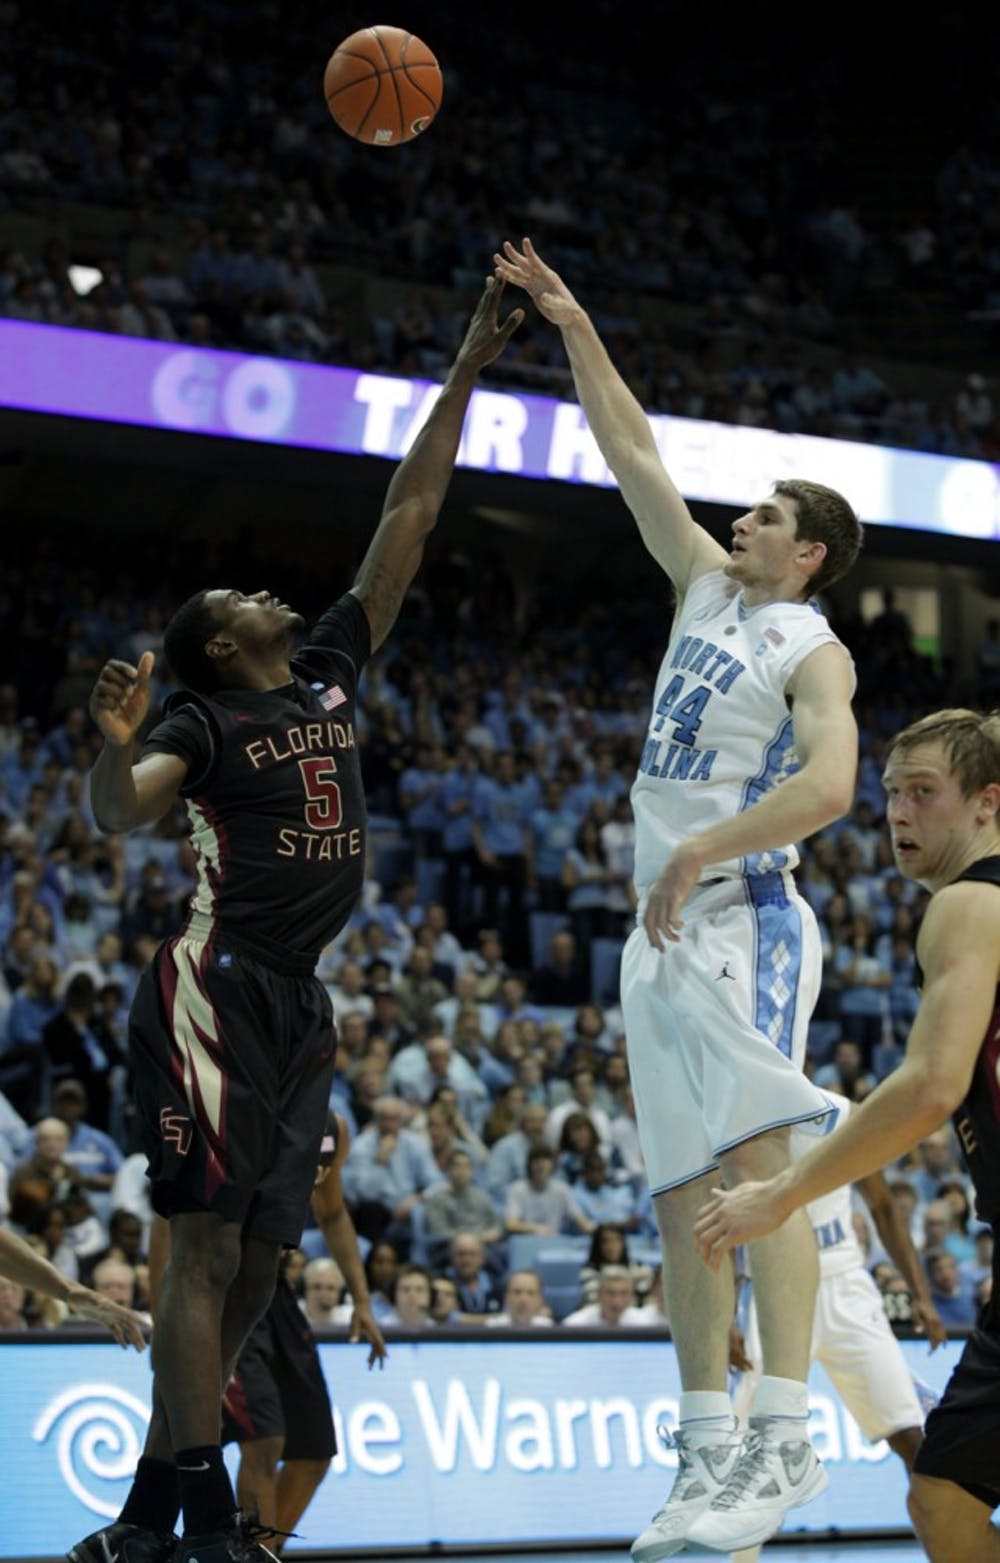 The University of North Carolina Tar Heels played the Florida State Seminoles on Sunday, February 6, 2011.